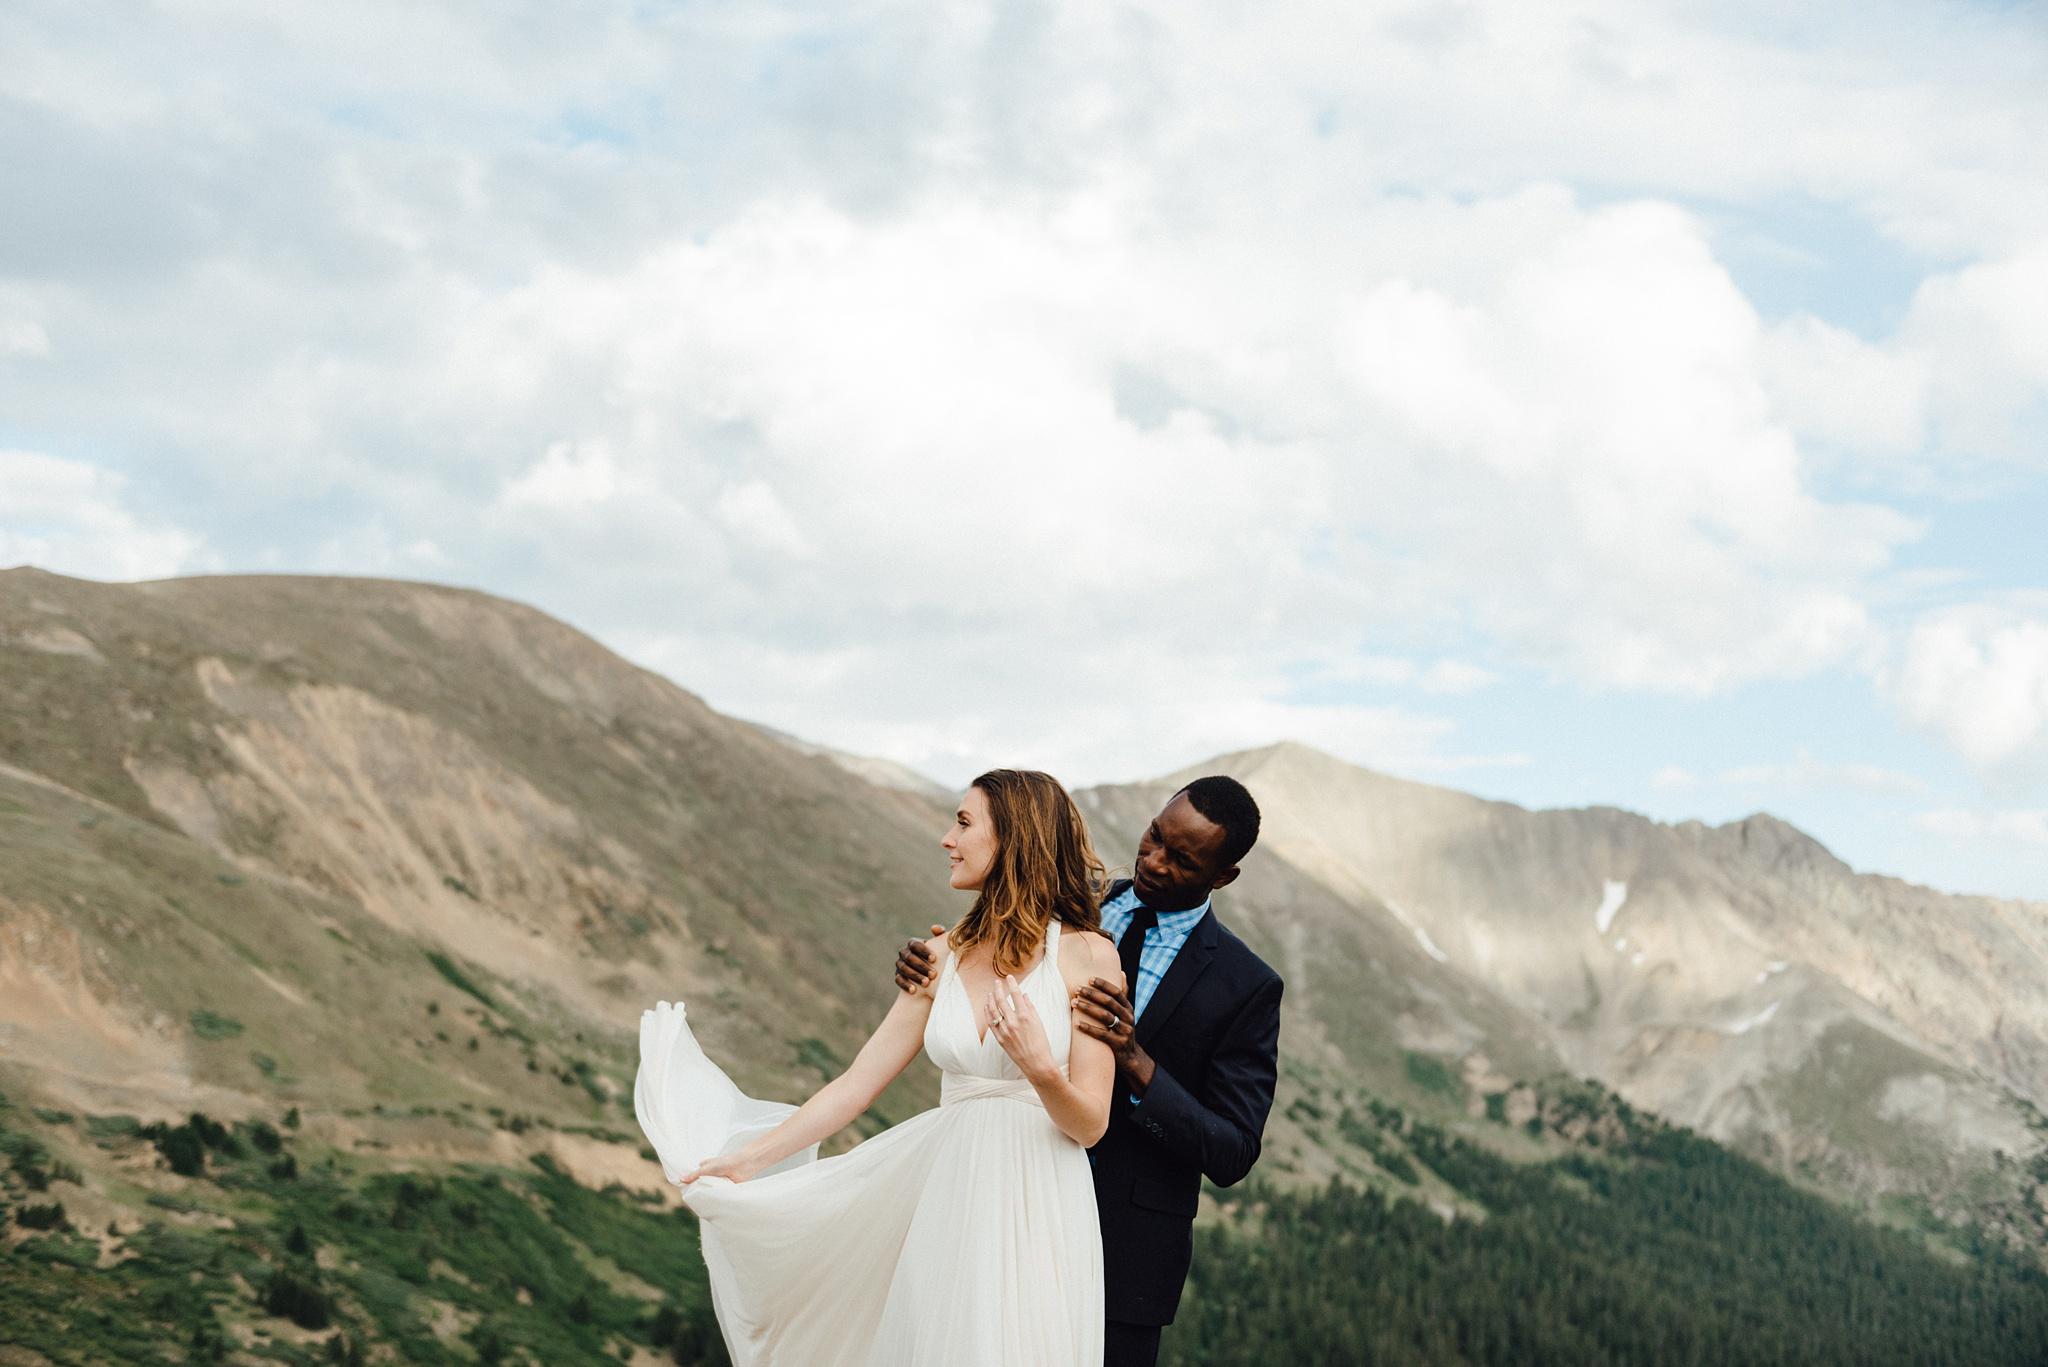 Rocky mountain national park wedding